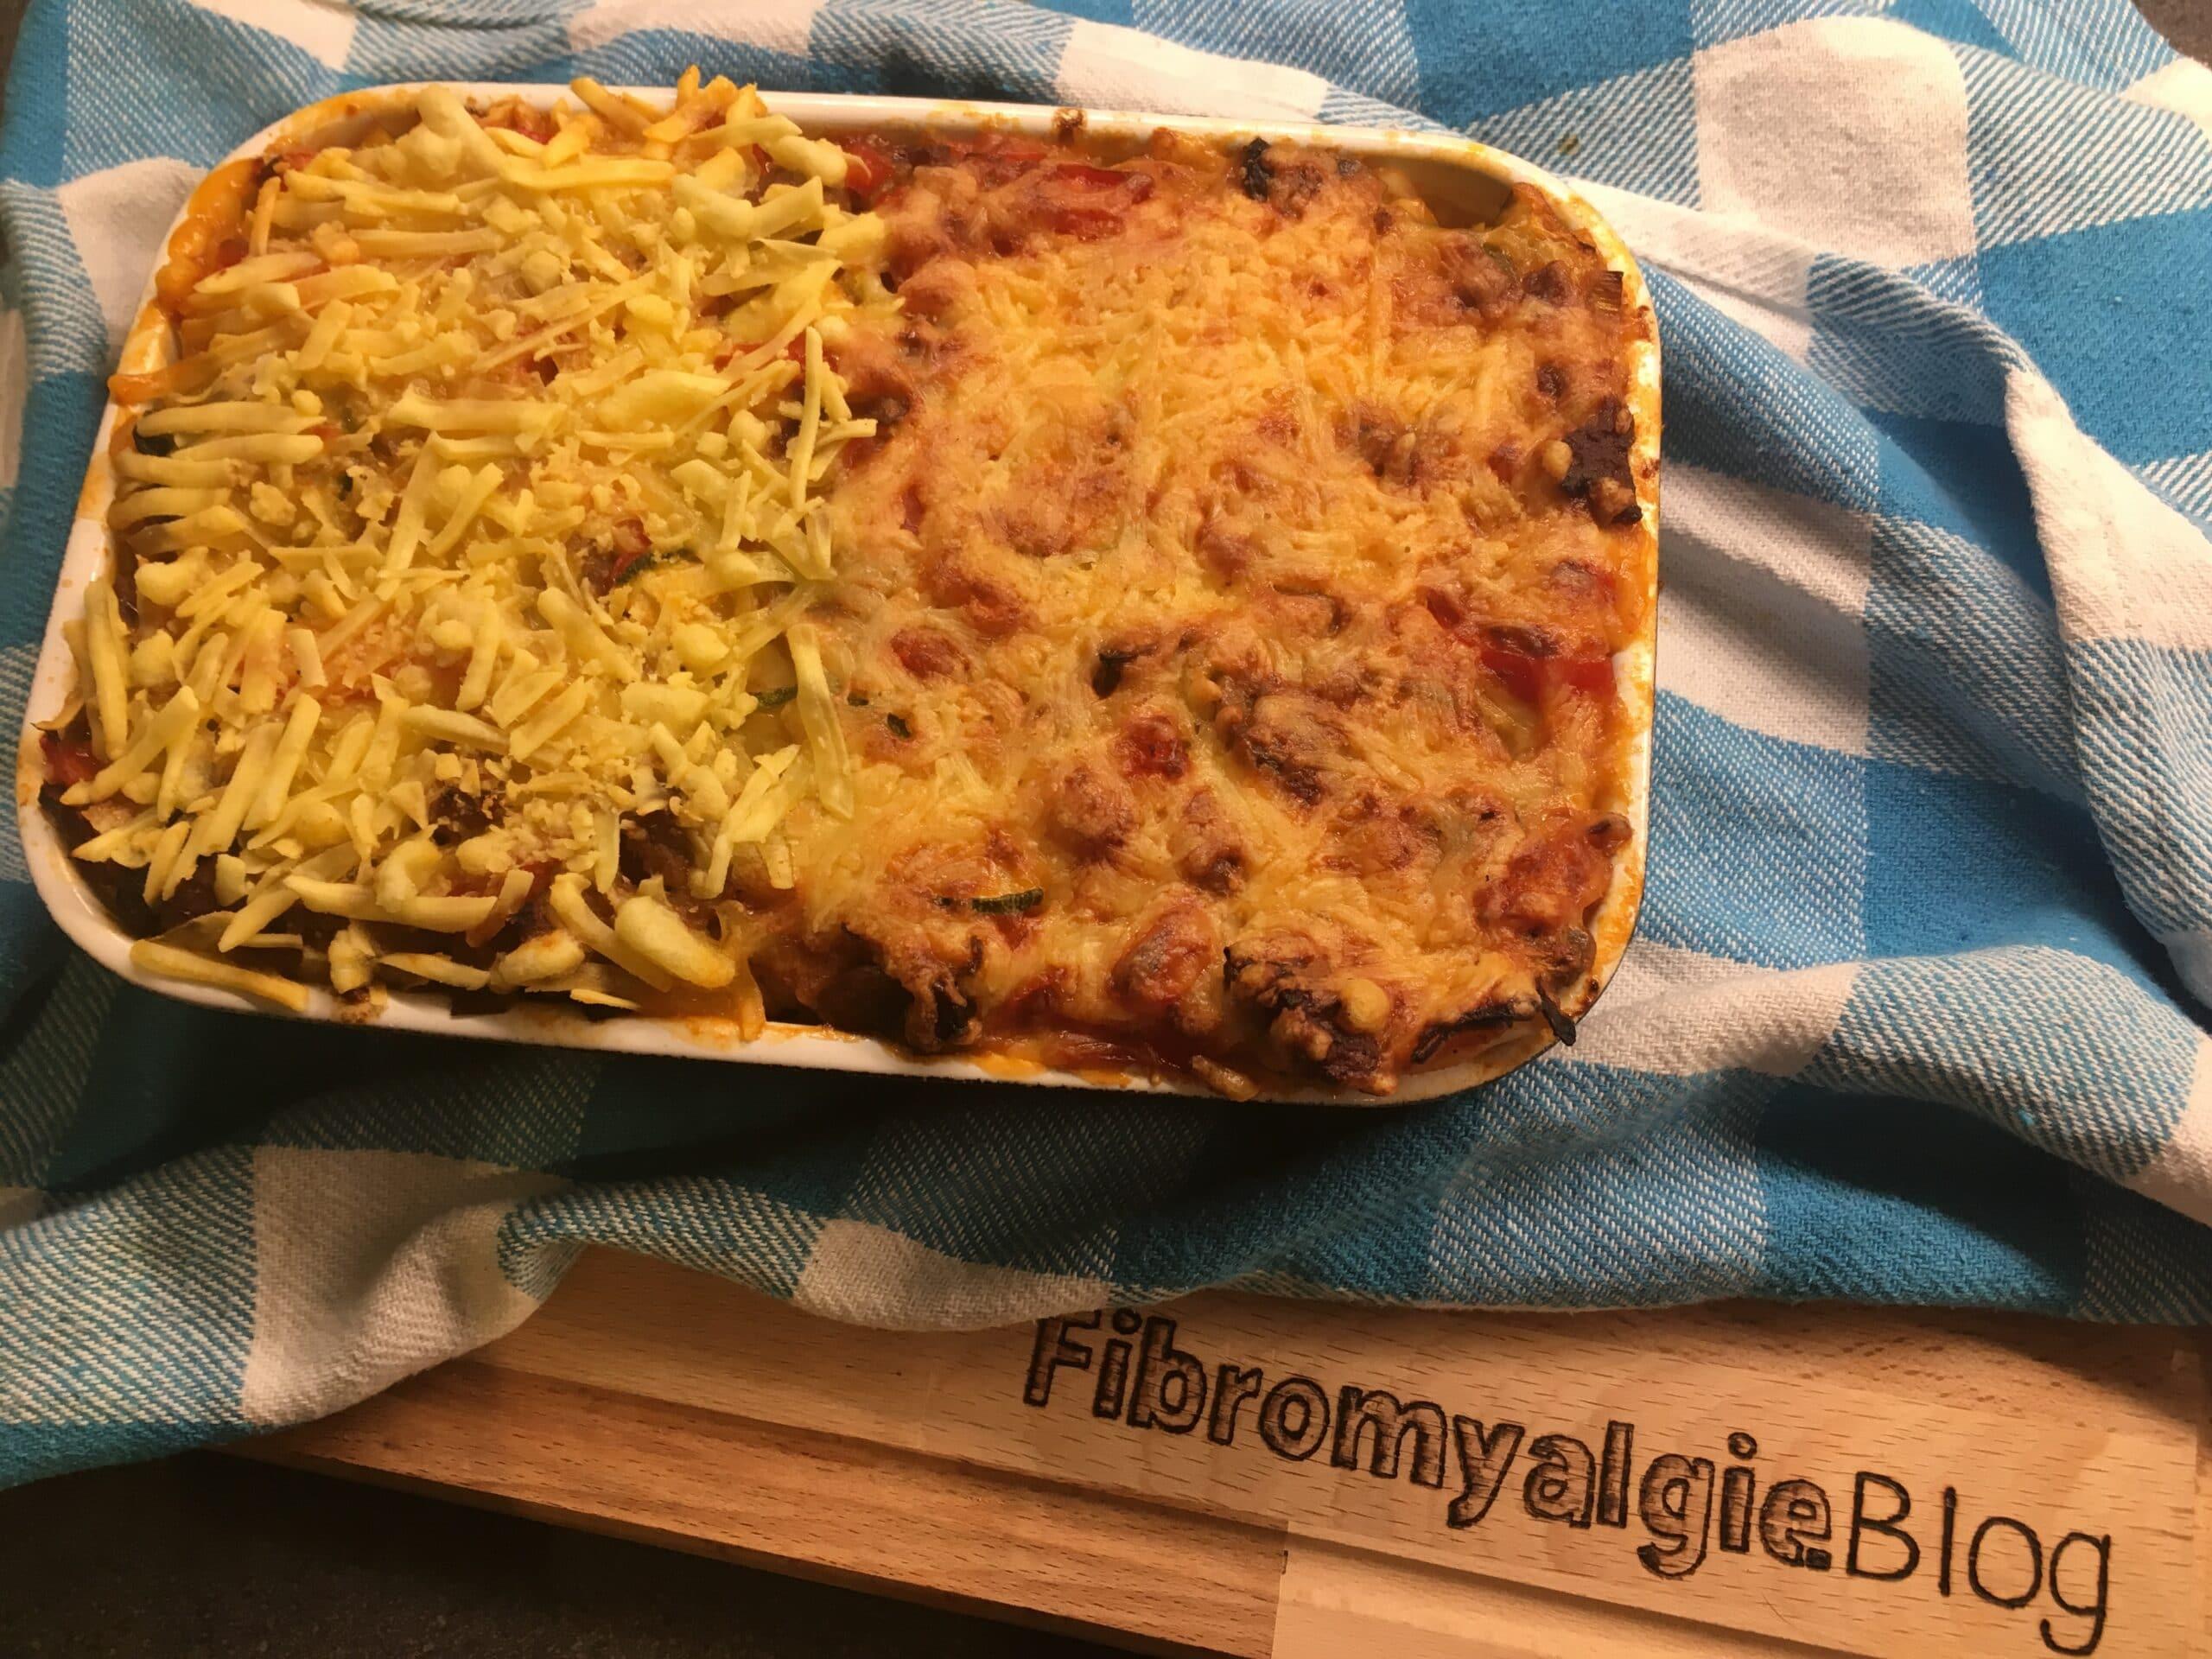 recept-lasagne-fibromyalgieblog